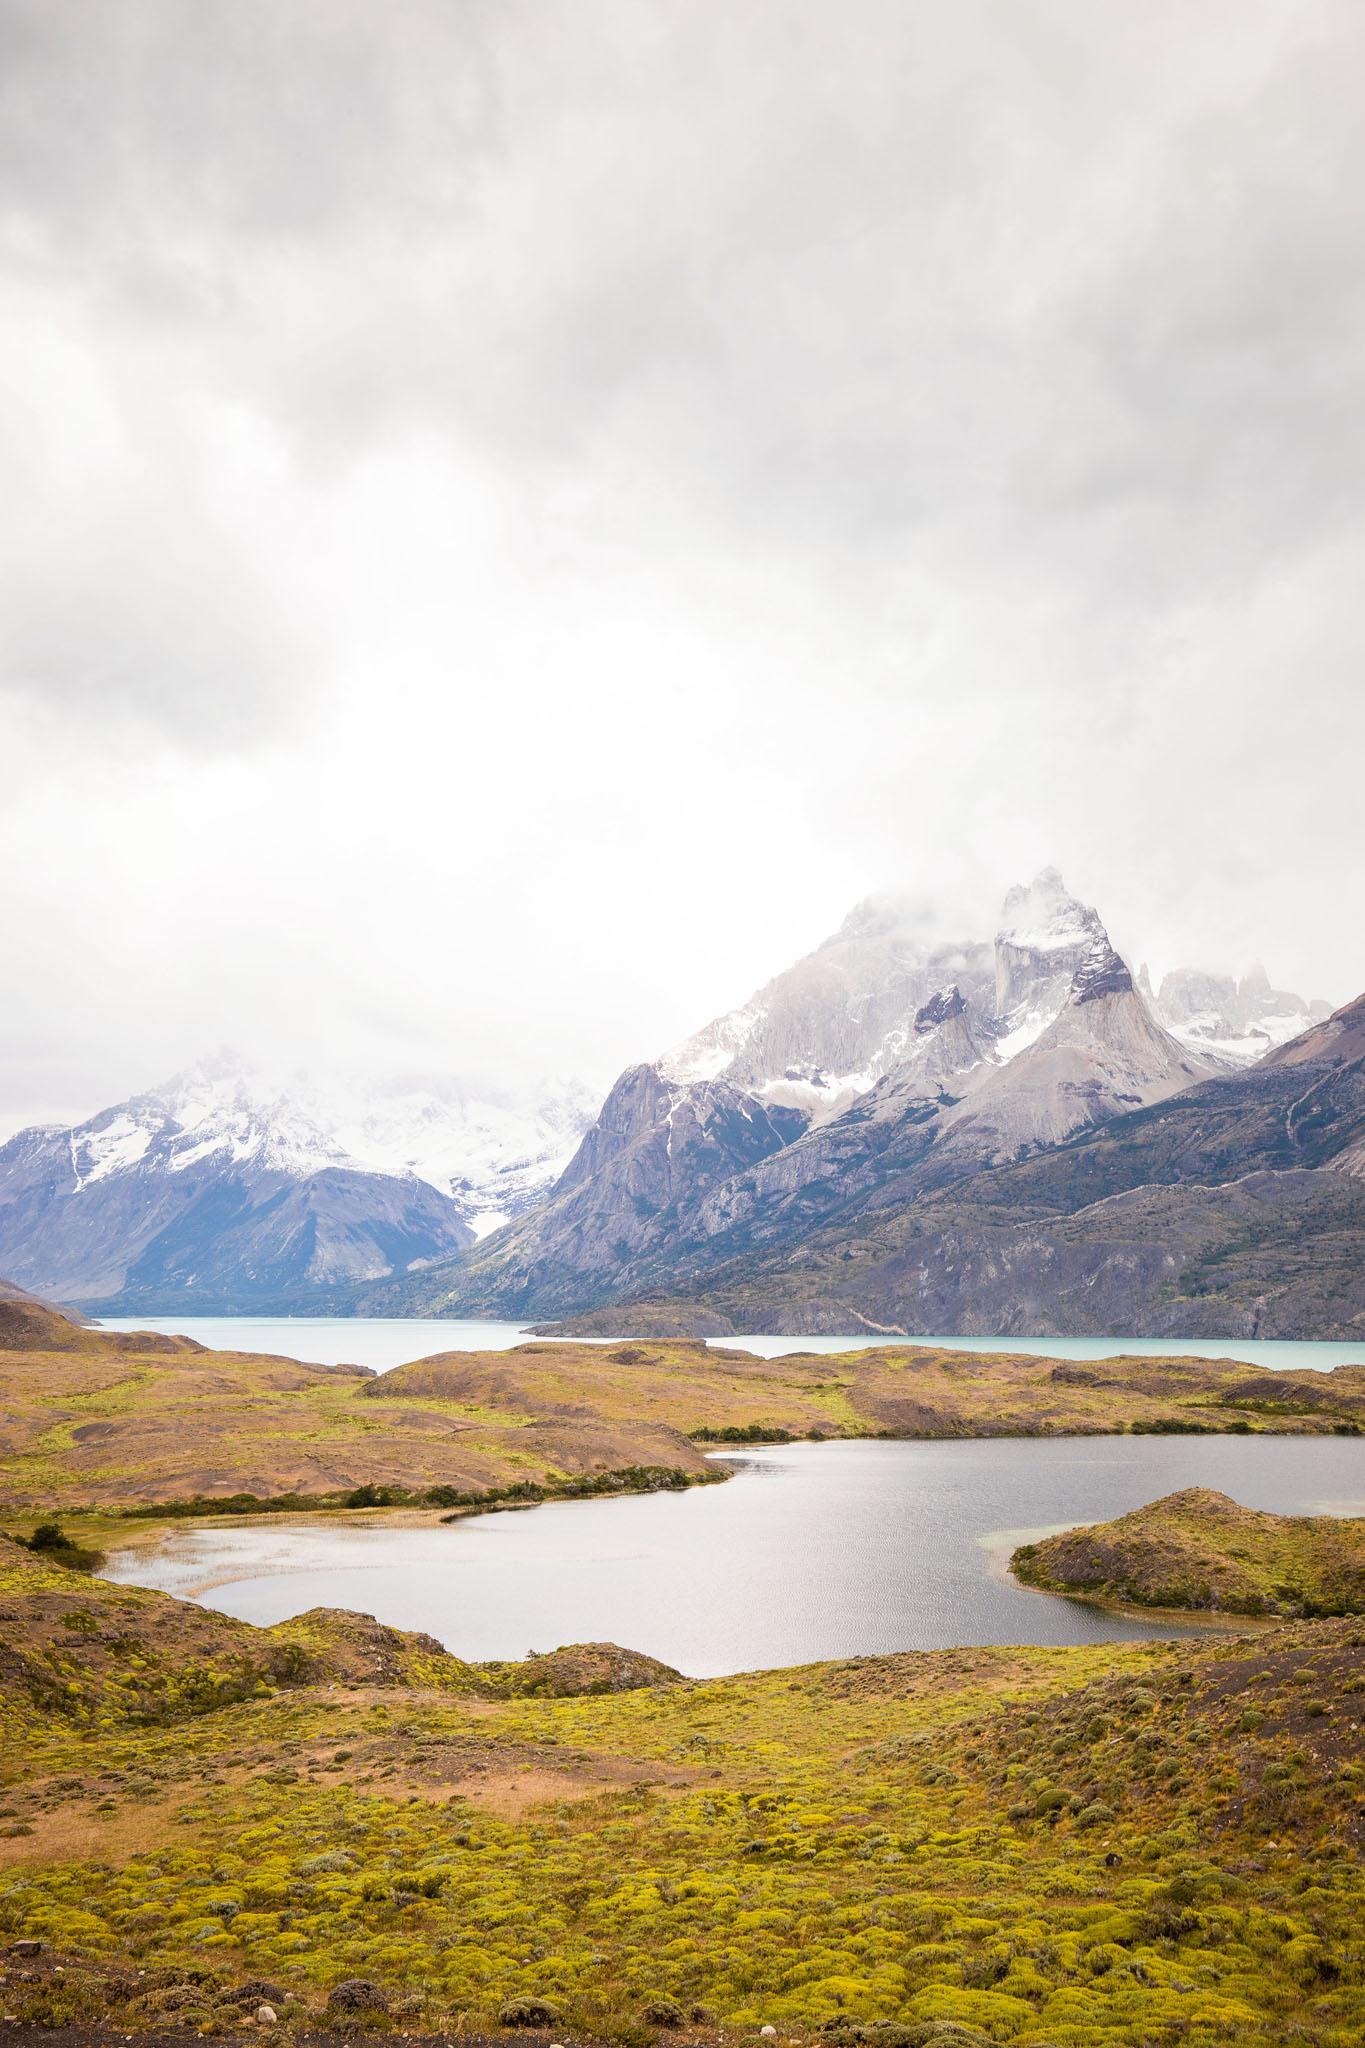 Wedding-Travellers-Overlanding-Destination-Wedding-Chile-Torres-del-Paine-lake-mountain